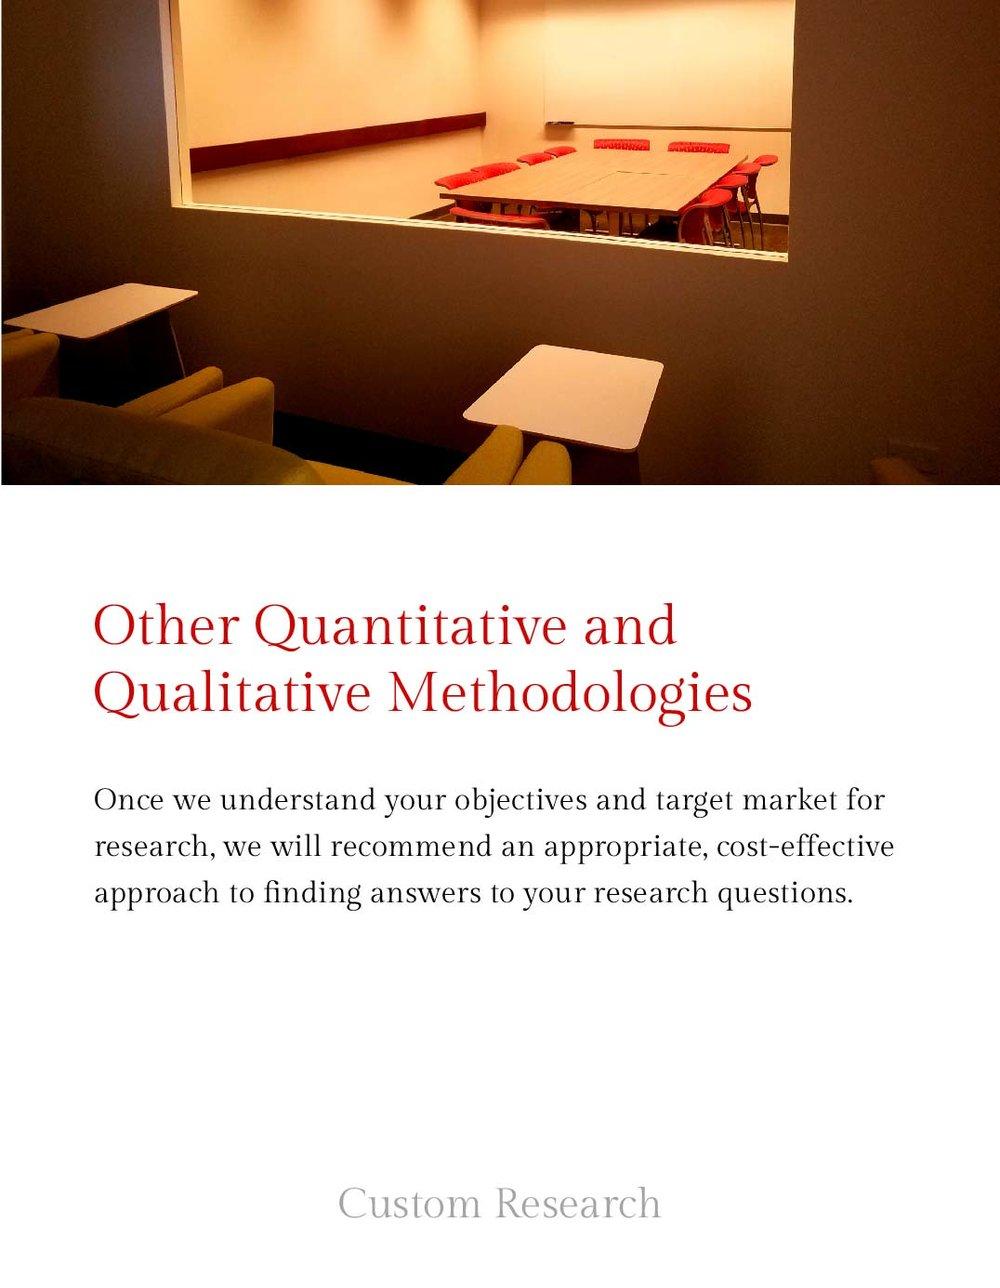 Other Quantitavtive and Qualitative Methodologies